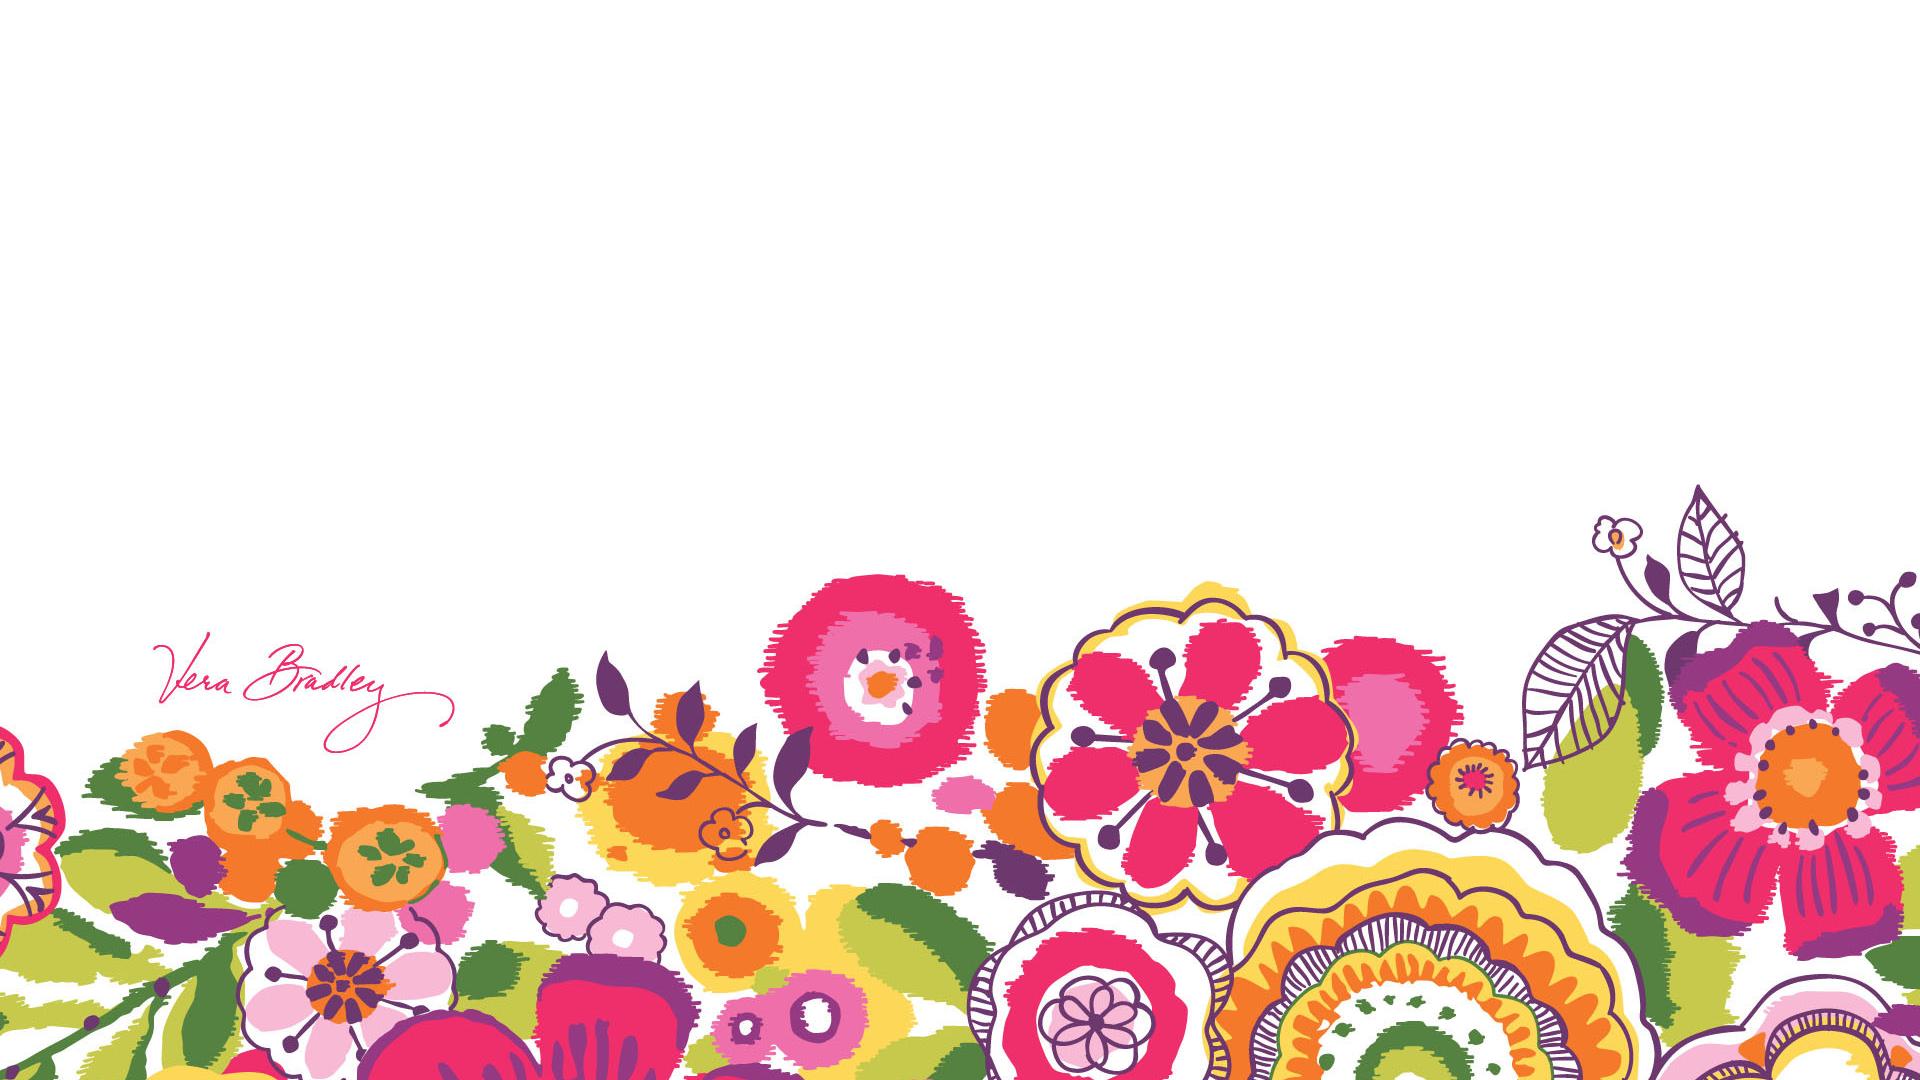 Free Download Browse Vera Bradley Wallpaper For Walls Hd Photo